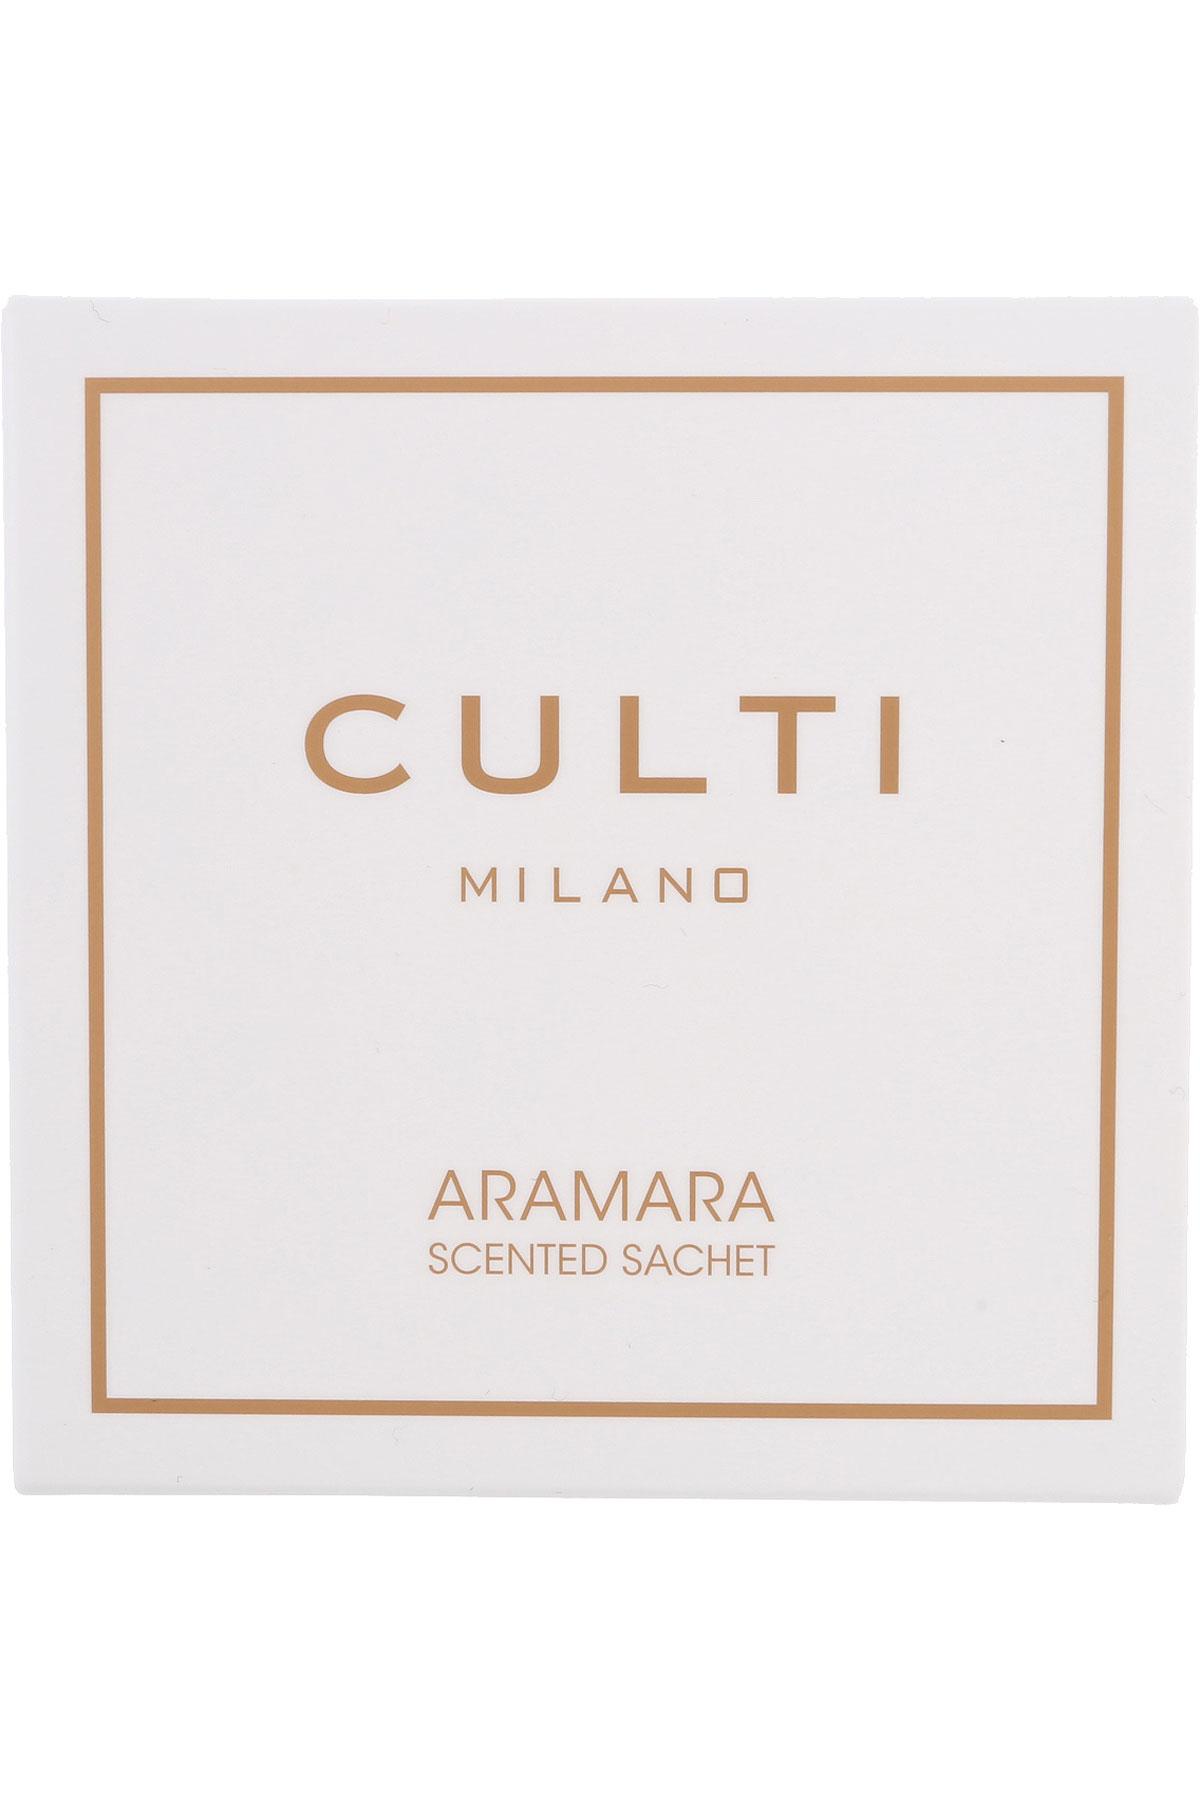 Culti Milano Home Scents for Men On Sale, Aramara - Home Scented Sachet , 2019